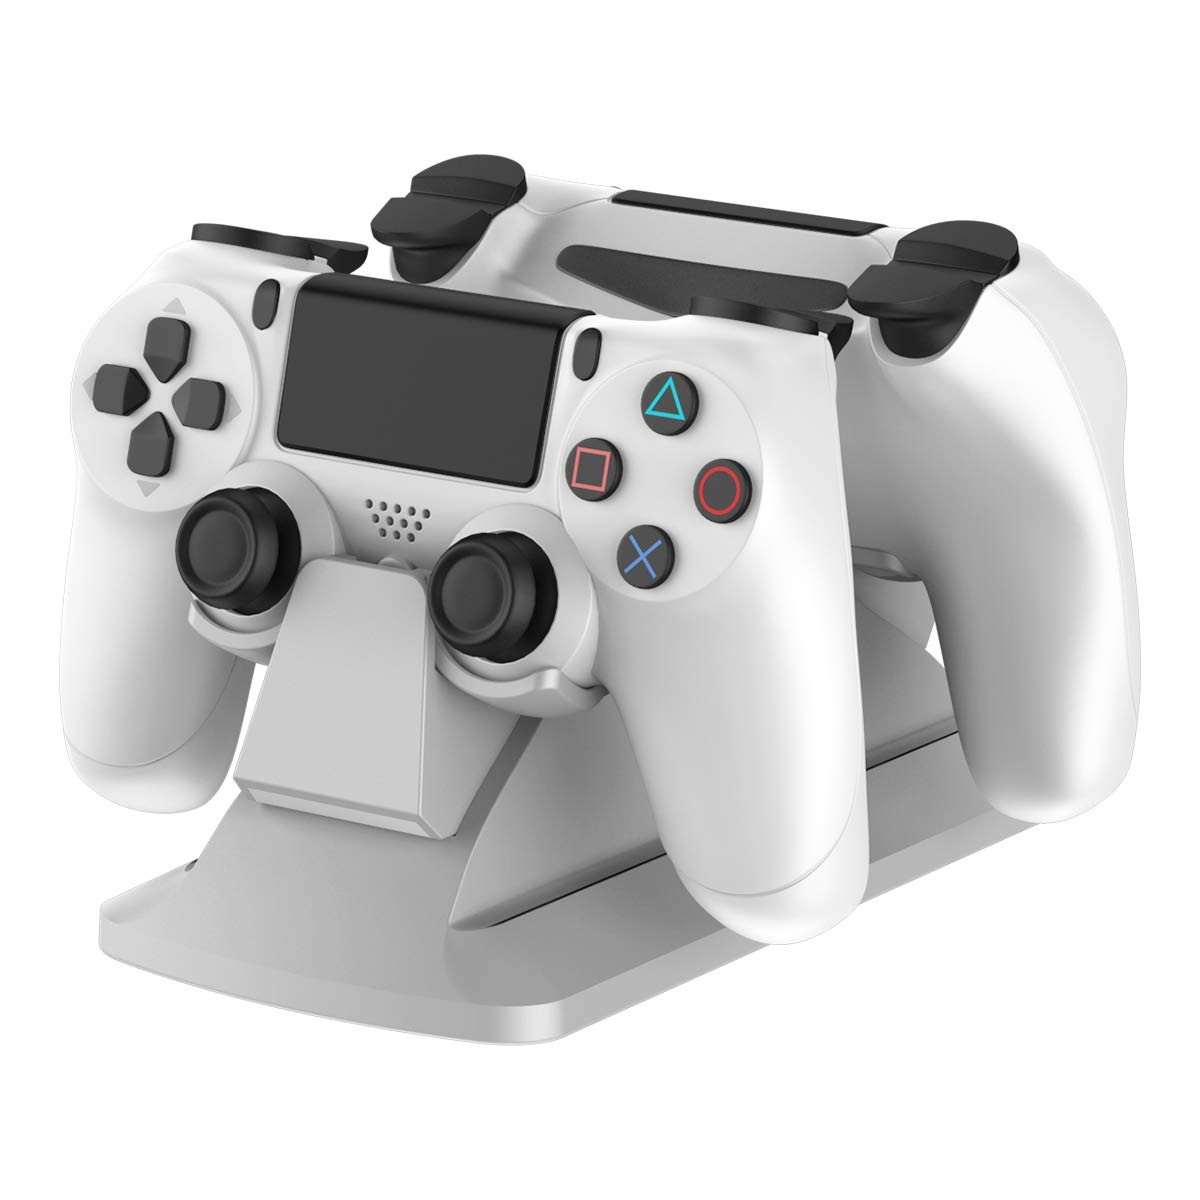 GameSir Dual Controller Charging Station Stand